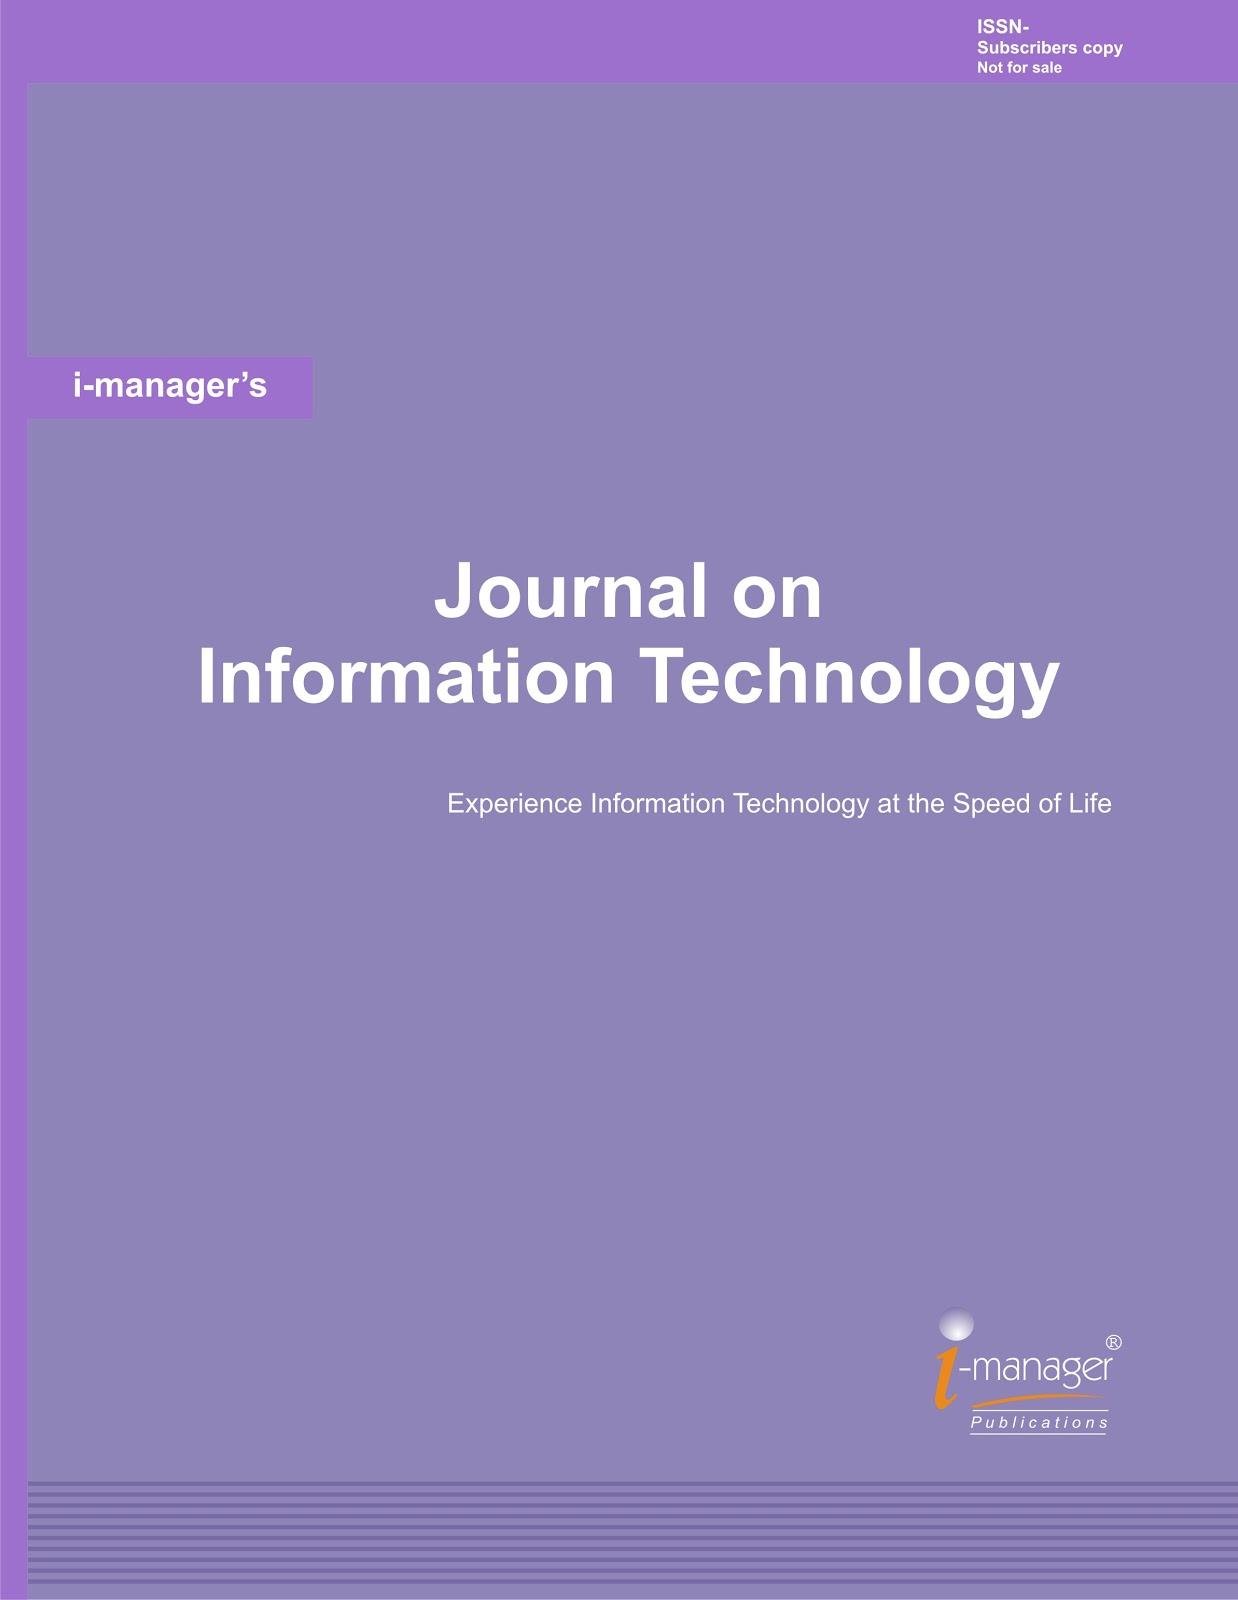 Technology Management Image: I-manager's Journal On Information Technology: I-manager's